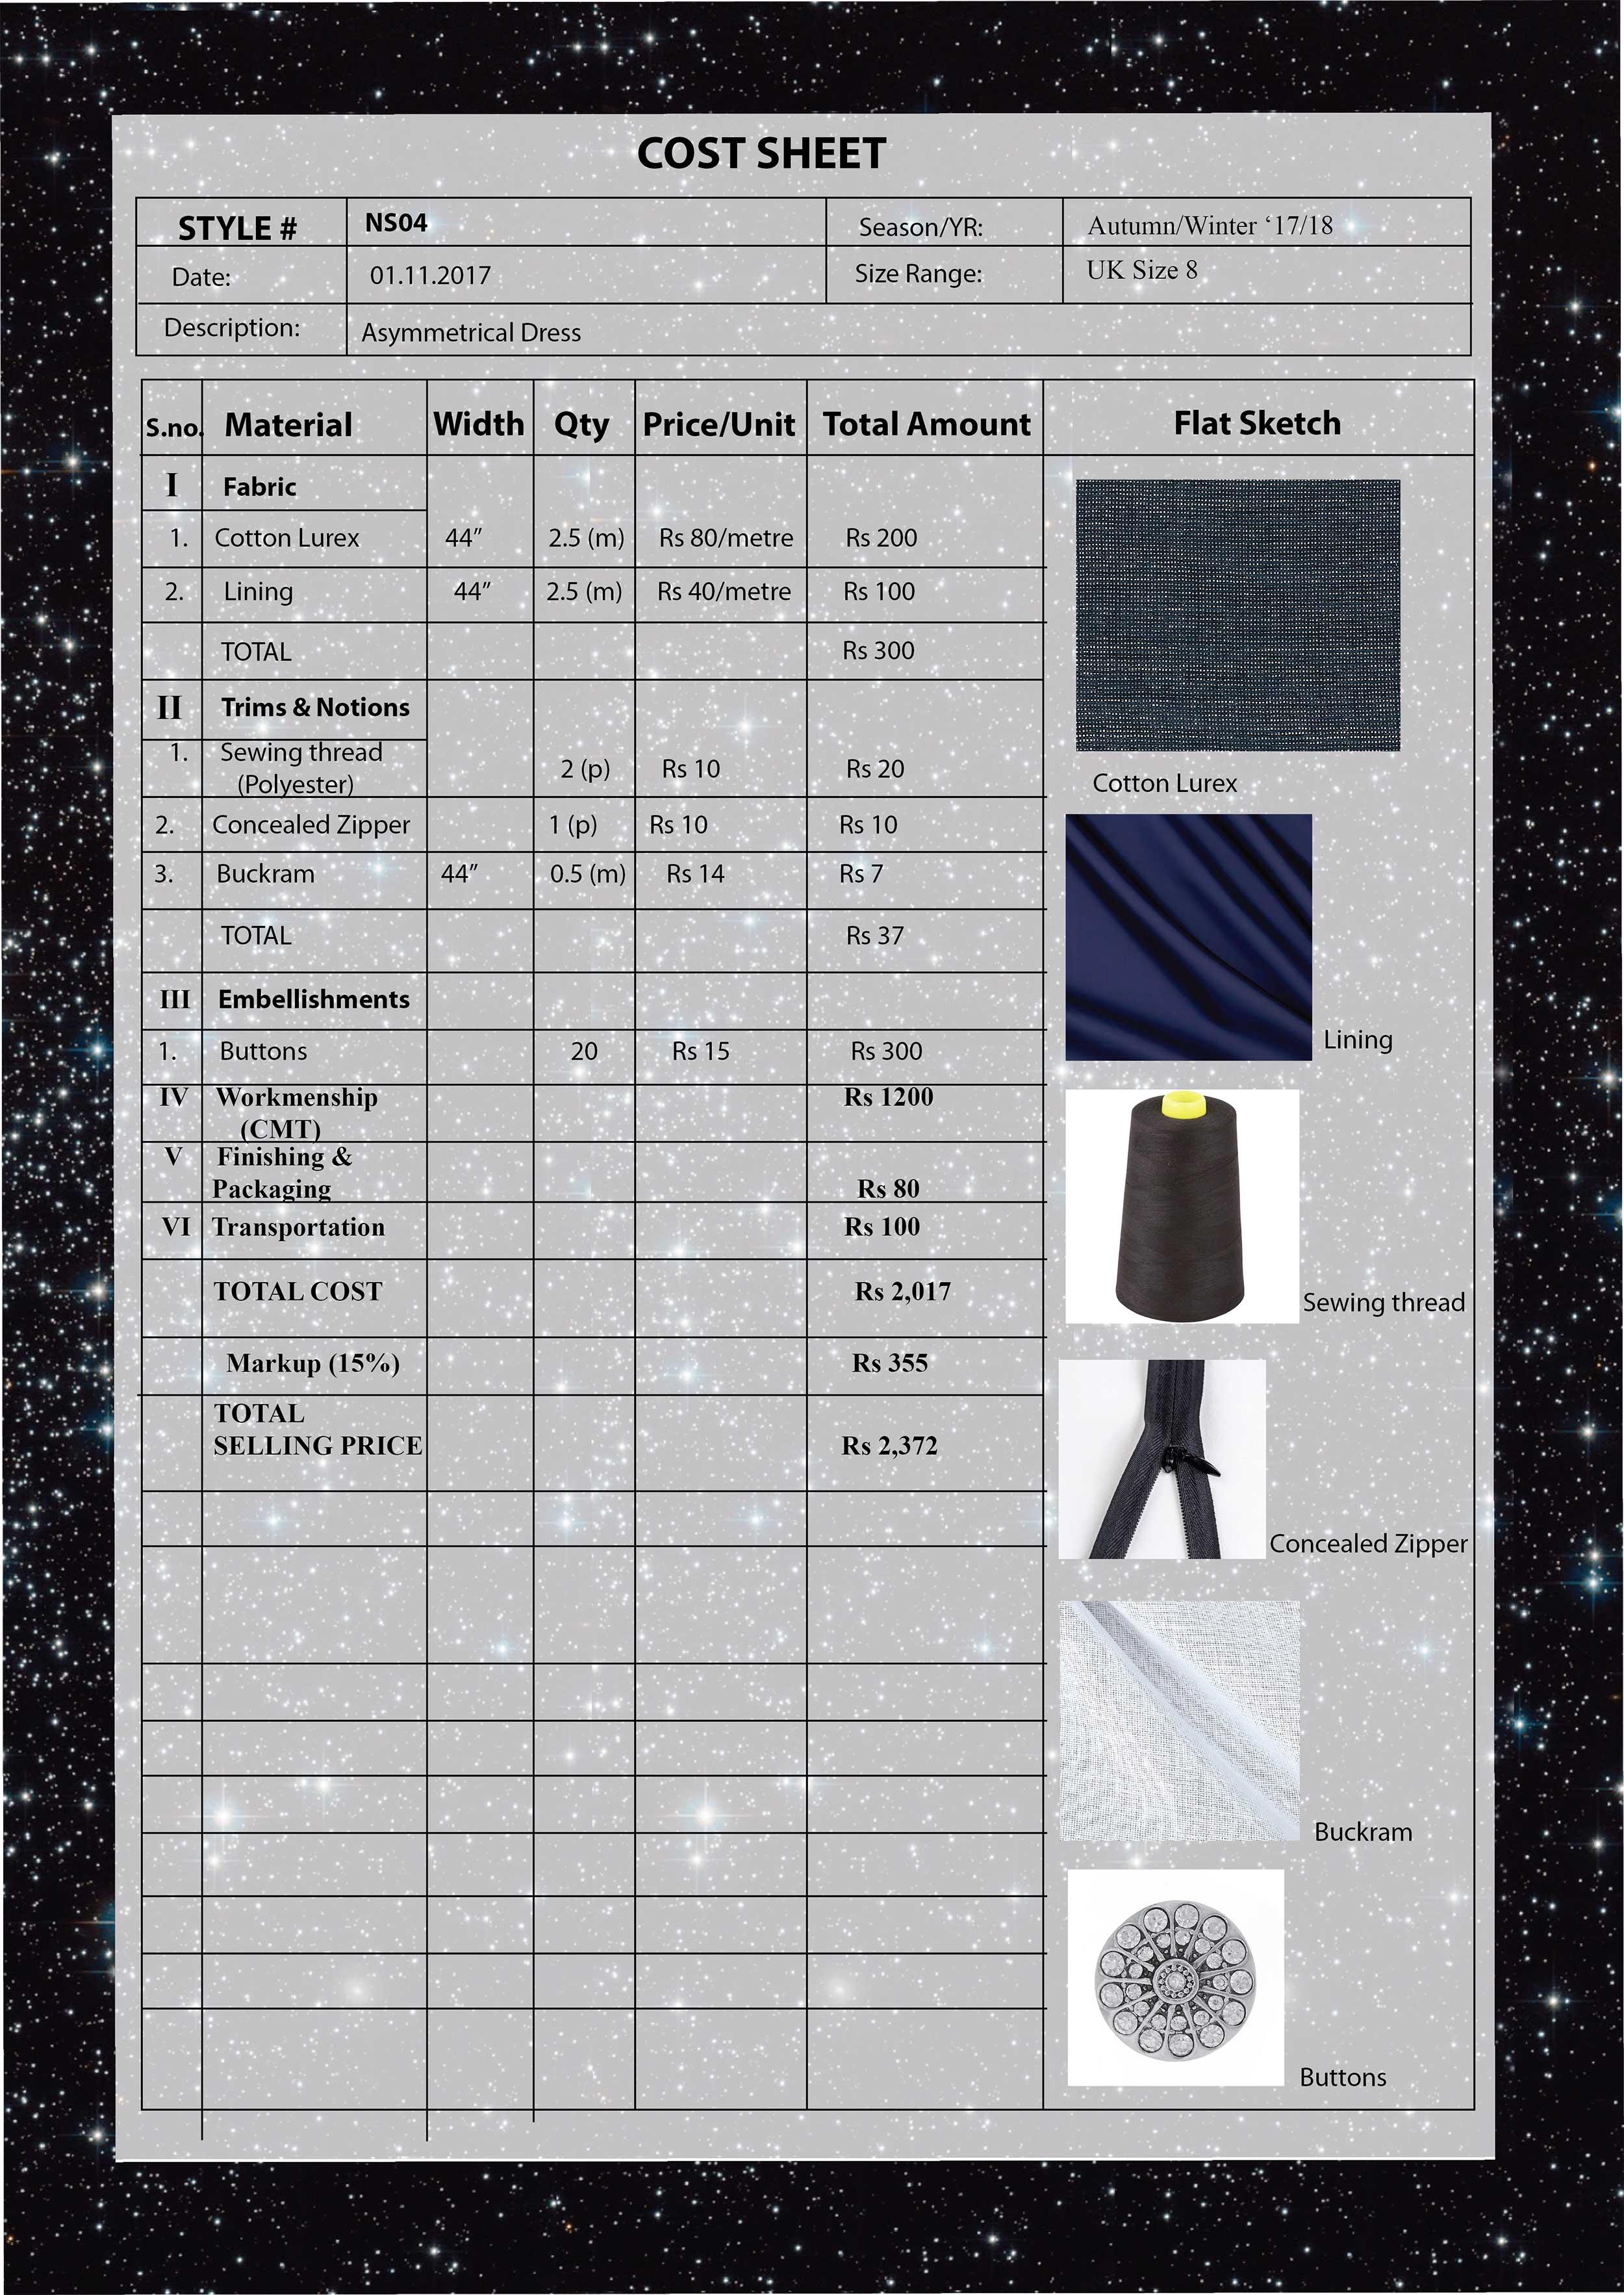 Cost Sheet-  Asymmetric Dress with cutout